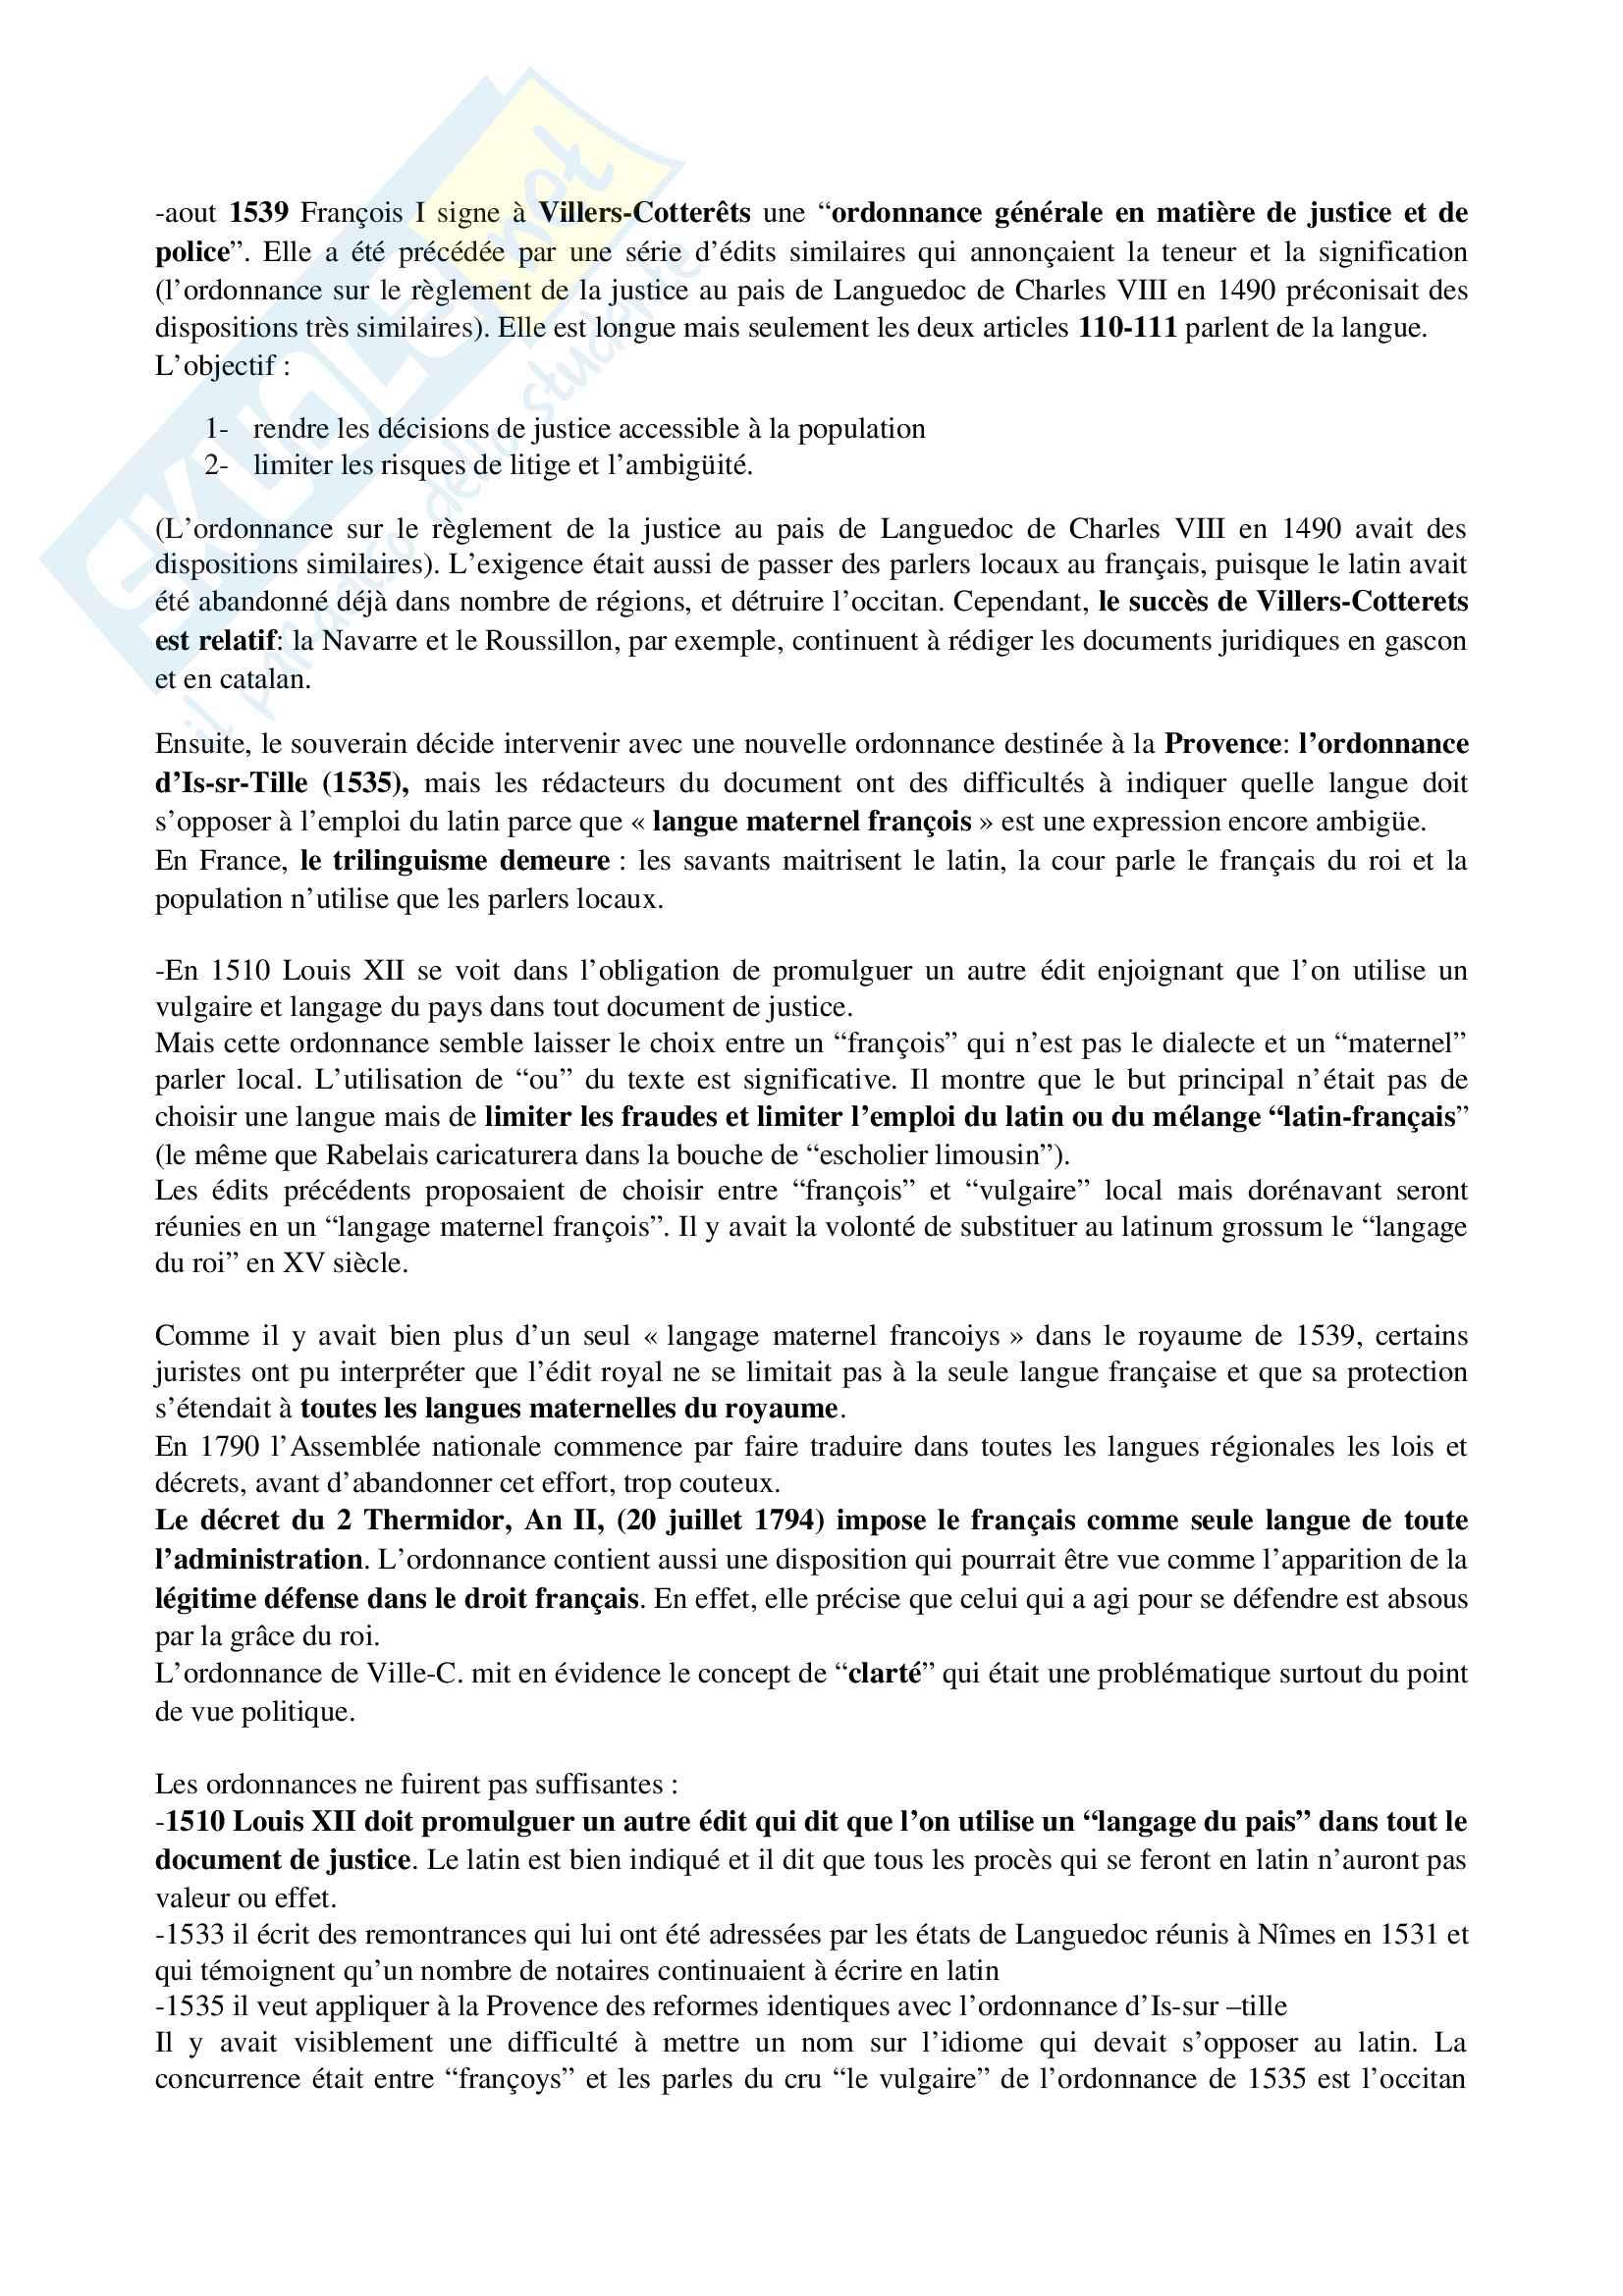 Riassunto esame di Linguistica Francese II, professoressa Di Pietro Pag. 11